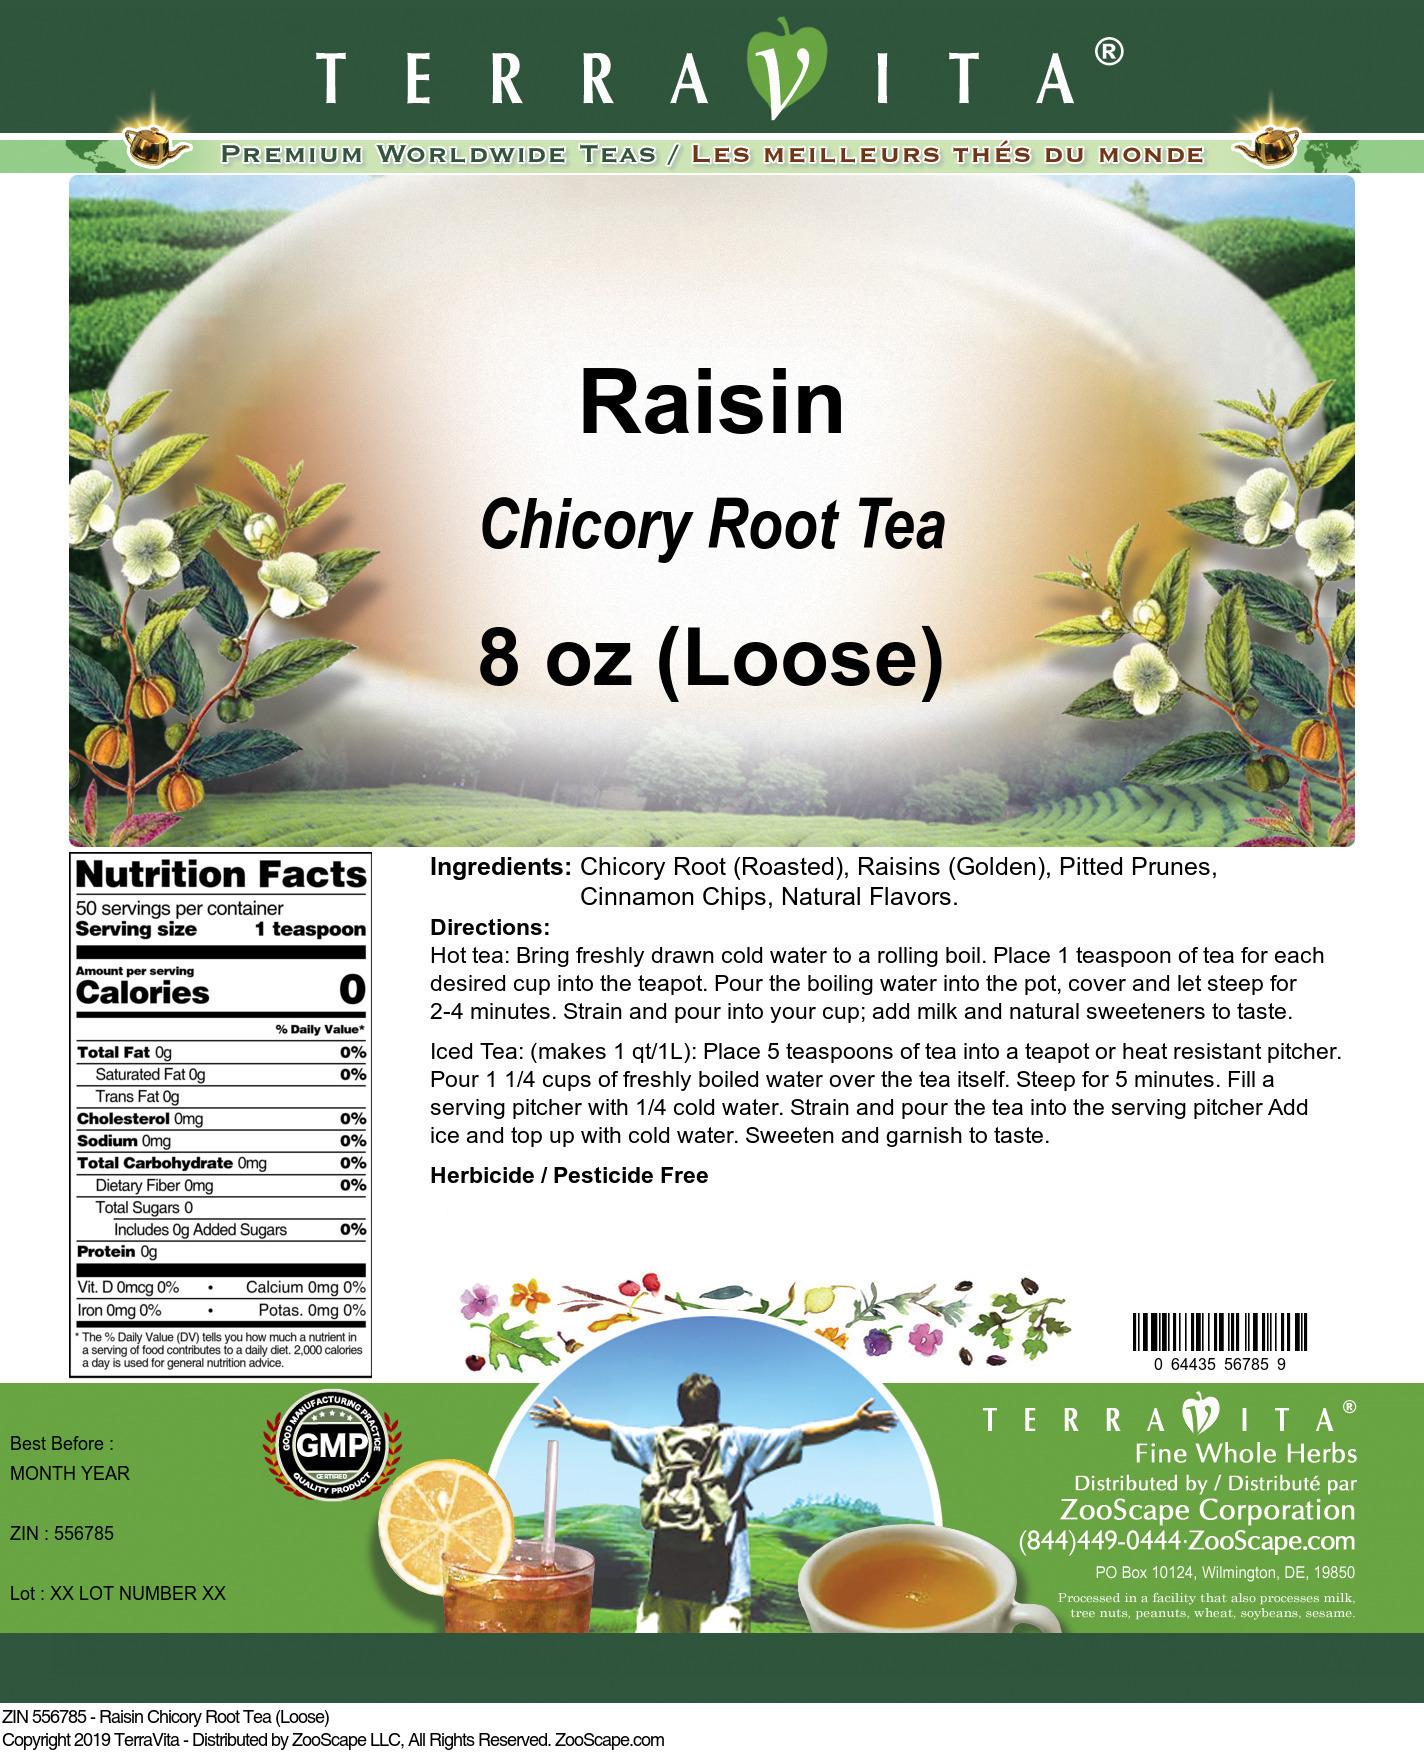 Raisin Chicory Root Tea (Loose)